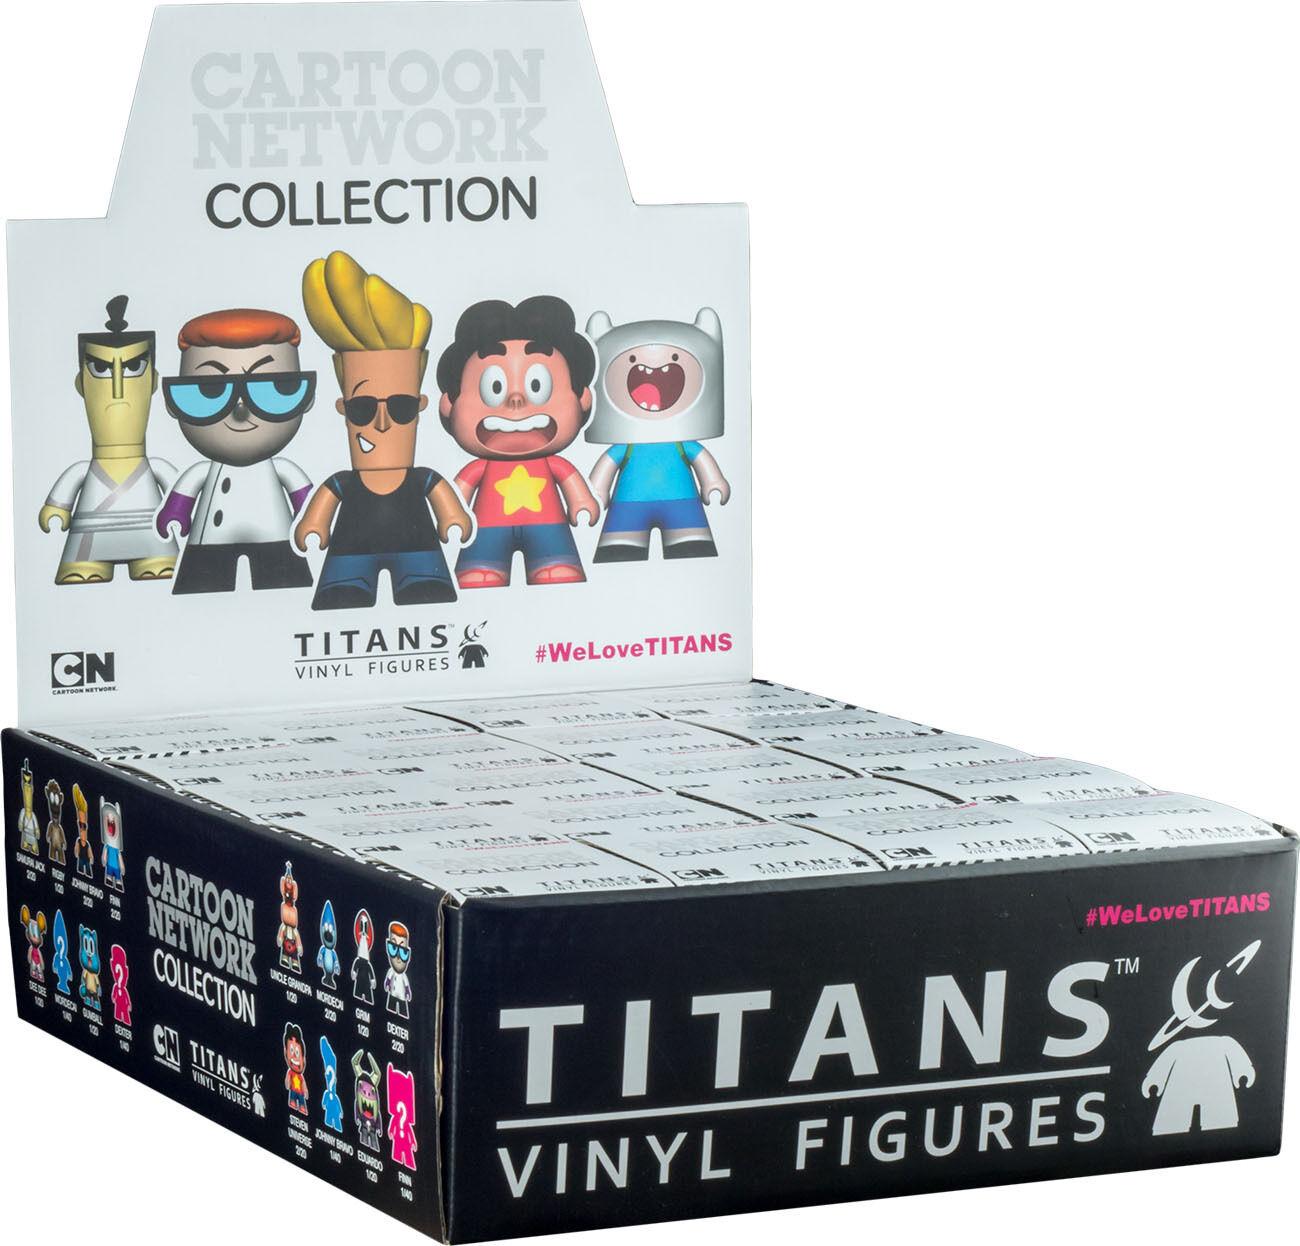 CARTOON NETWORK - 3  Series 1 Blind Box Titans Titans Titans Vinyl Figurines Display (20ct) 233c34